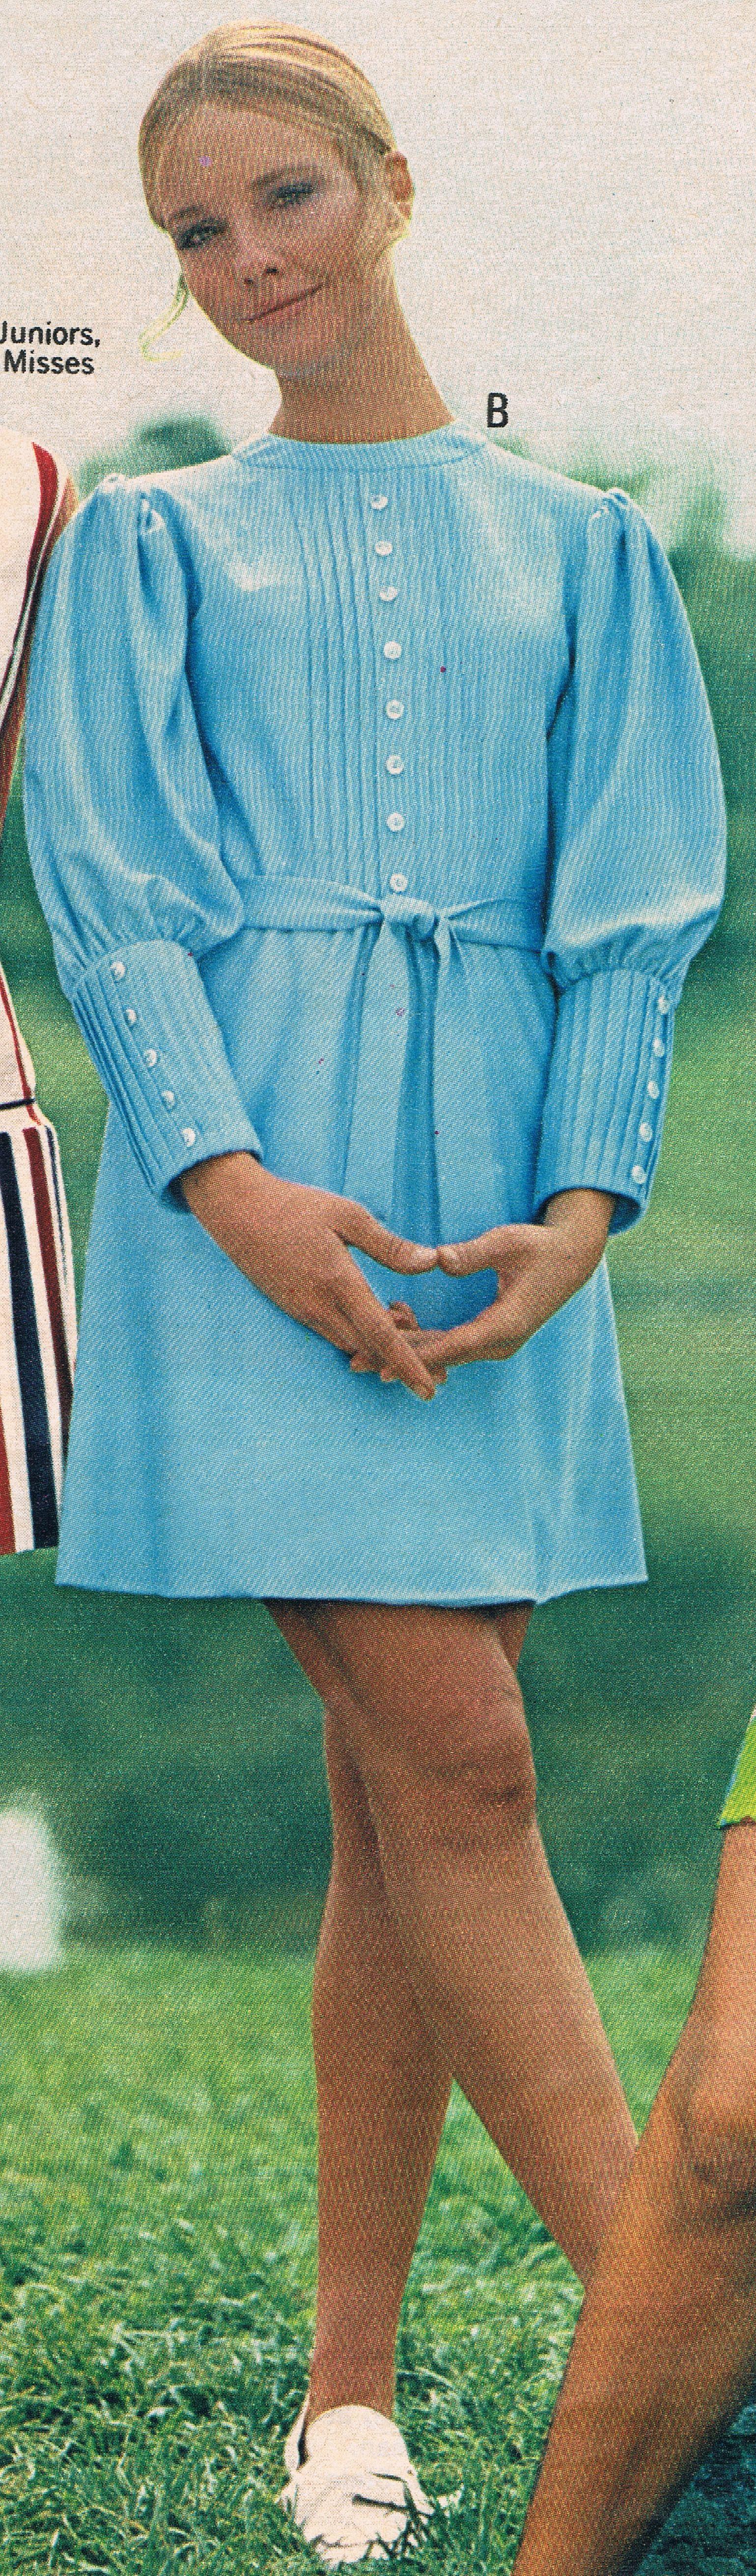 Penneys 1970 catalog.  Cay Sanderson